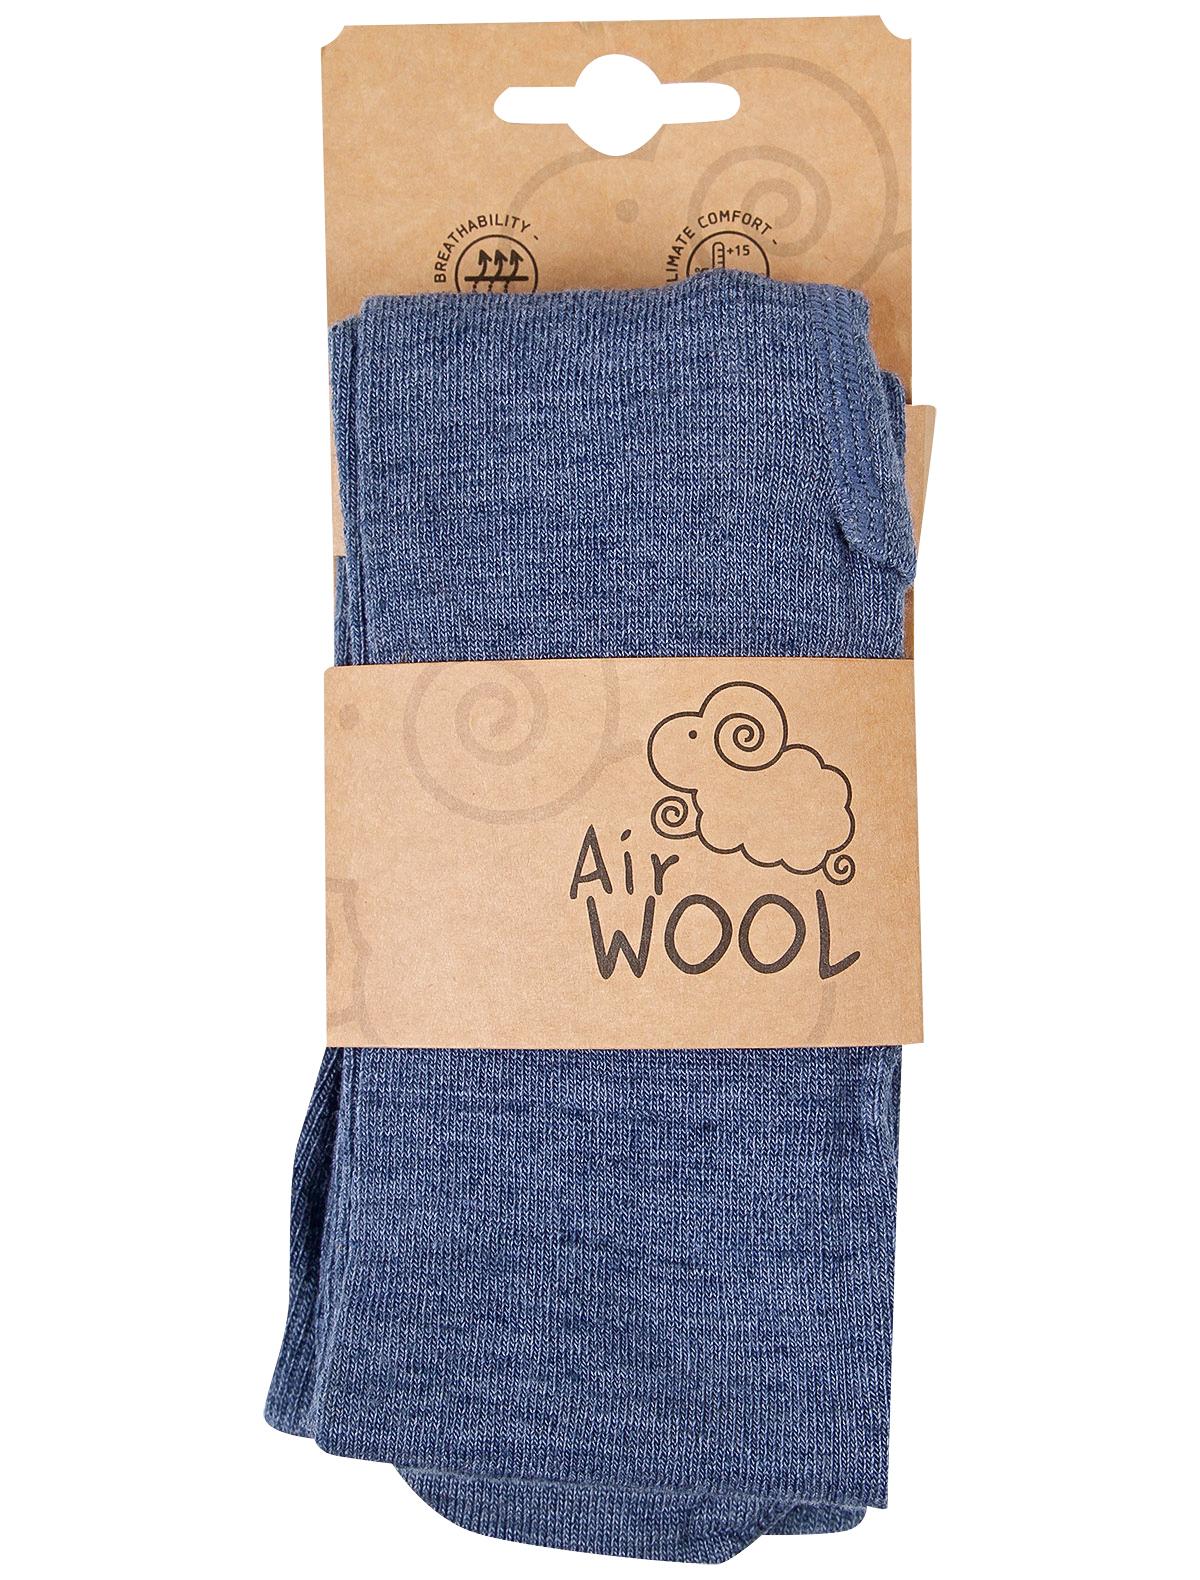 Купить 2135954, Колготки Air wool, синий, Женский, 1291409980041